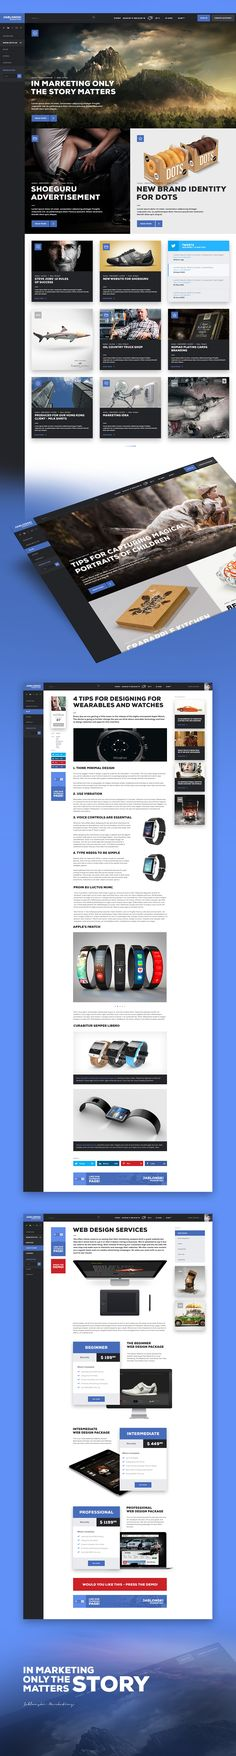 Jablonski Marketing UX & Branding